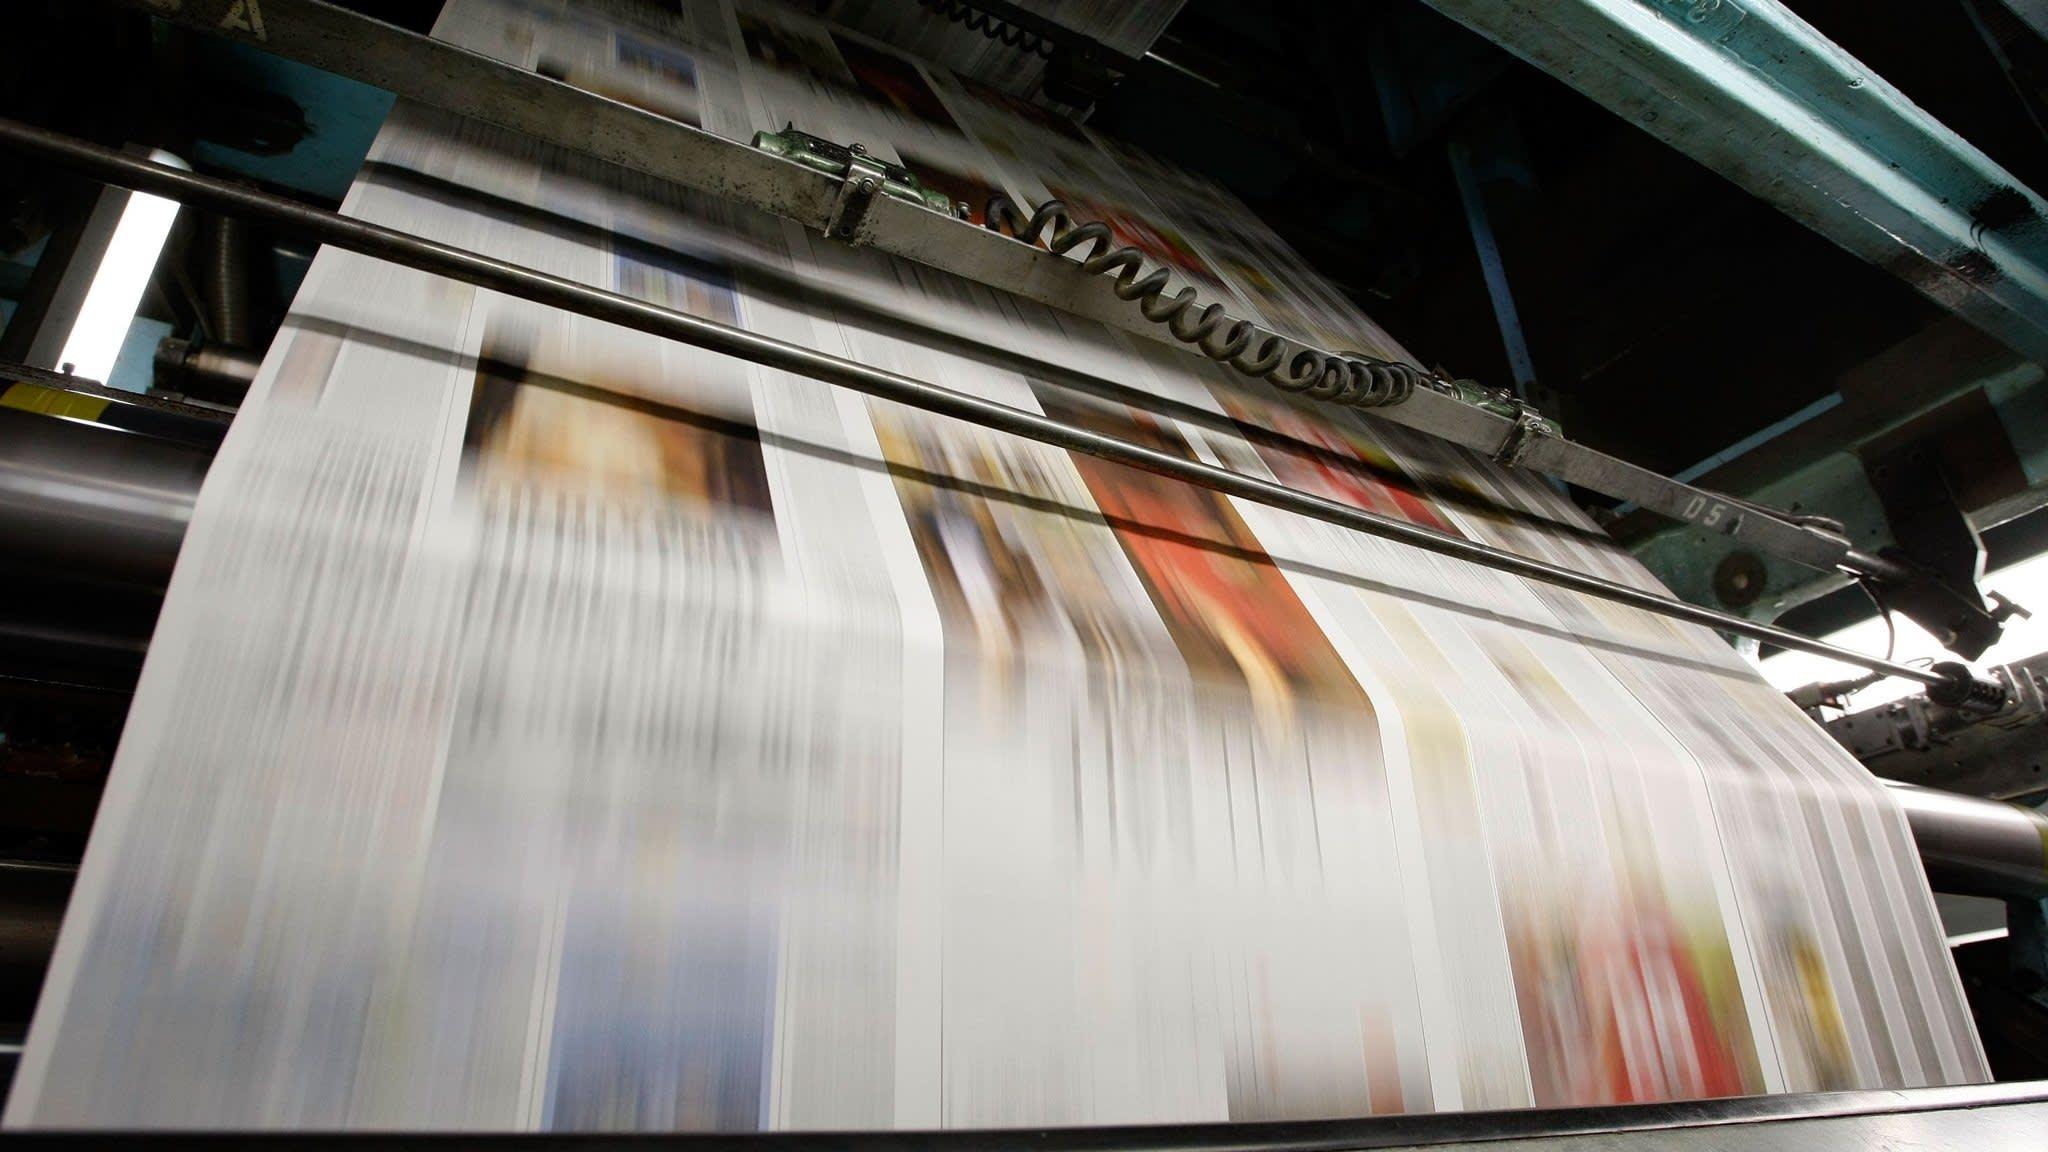 Newsprint tariffs send costs soaring for US newspapers